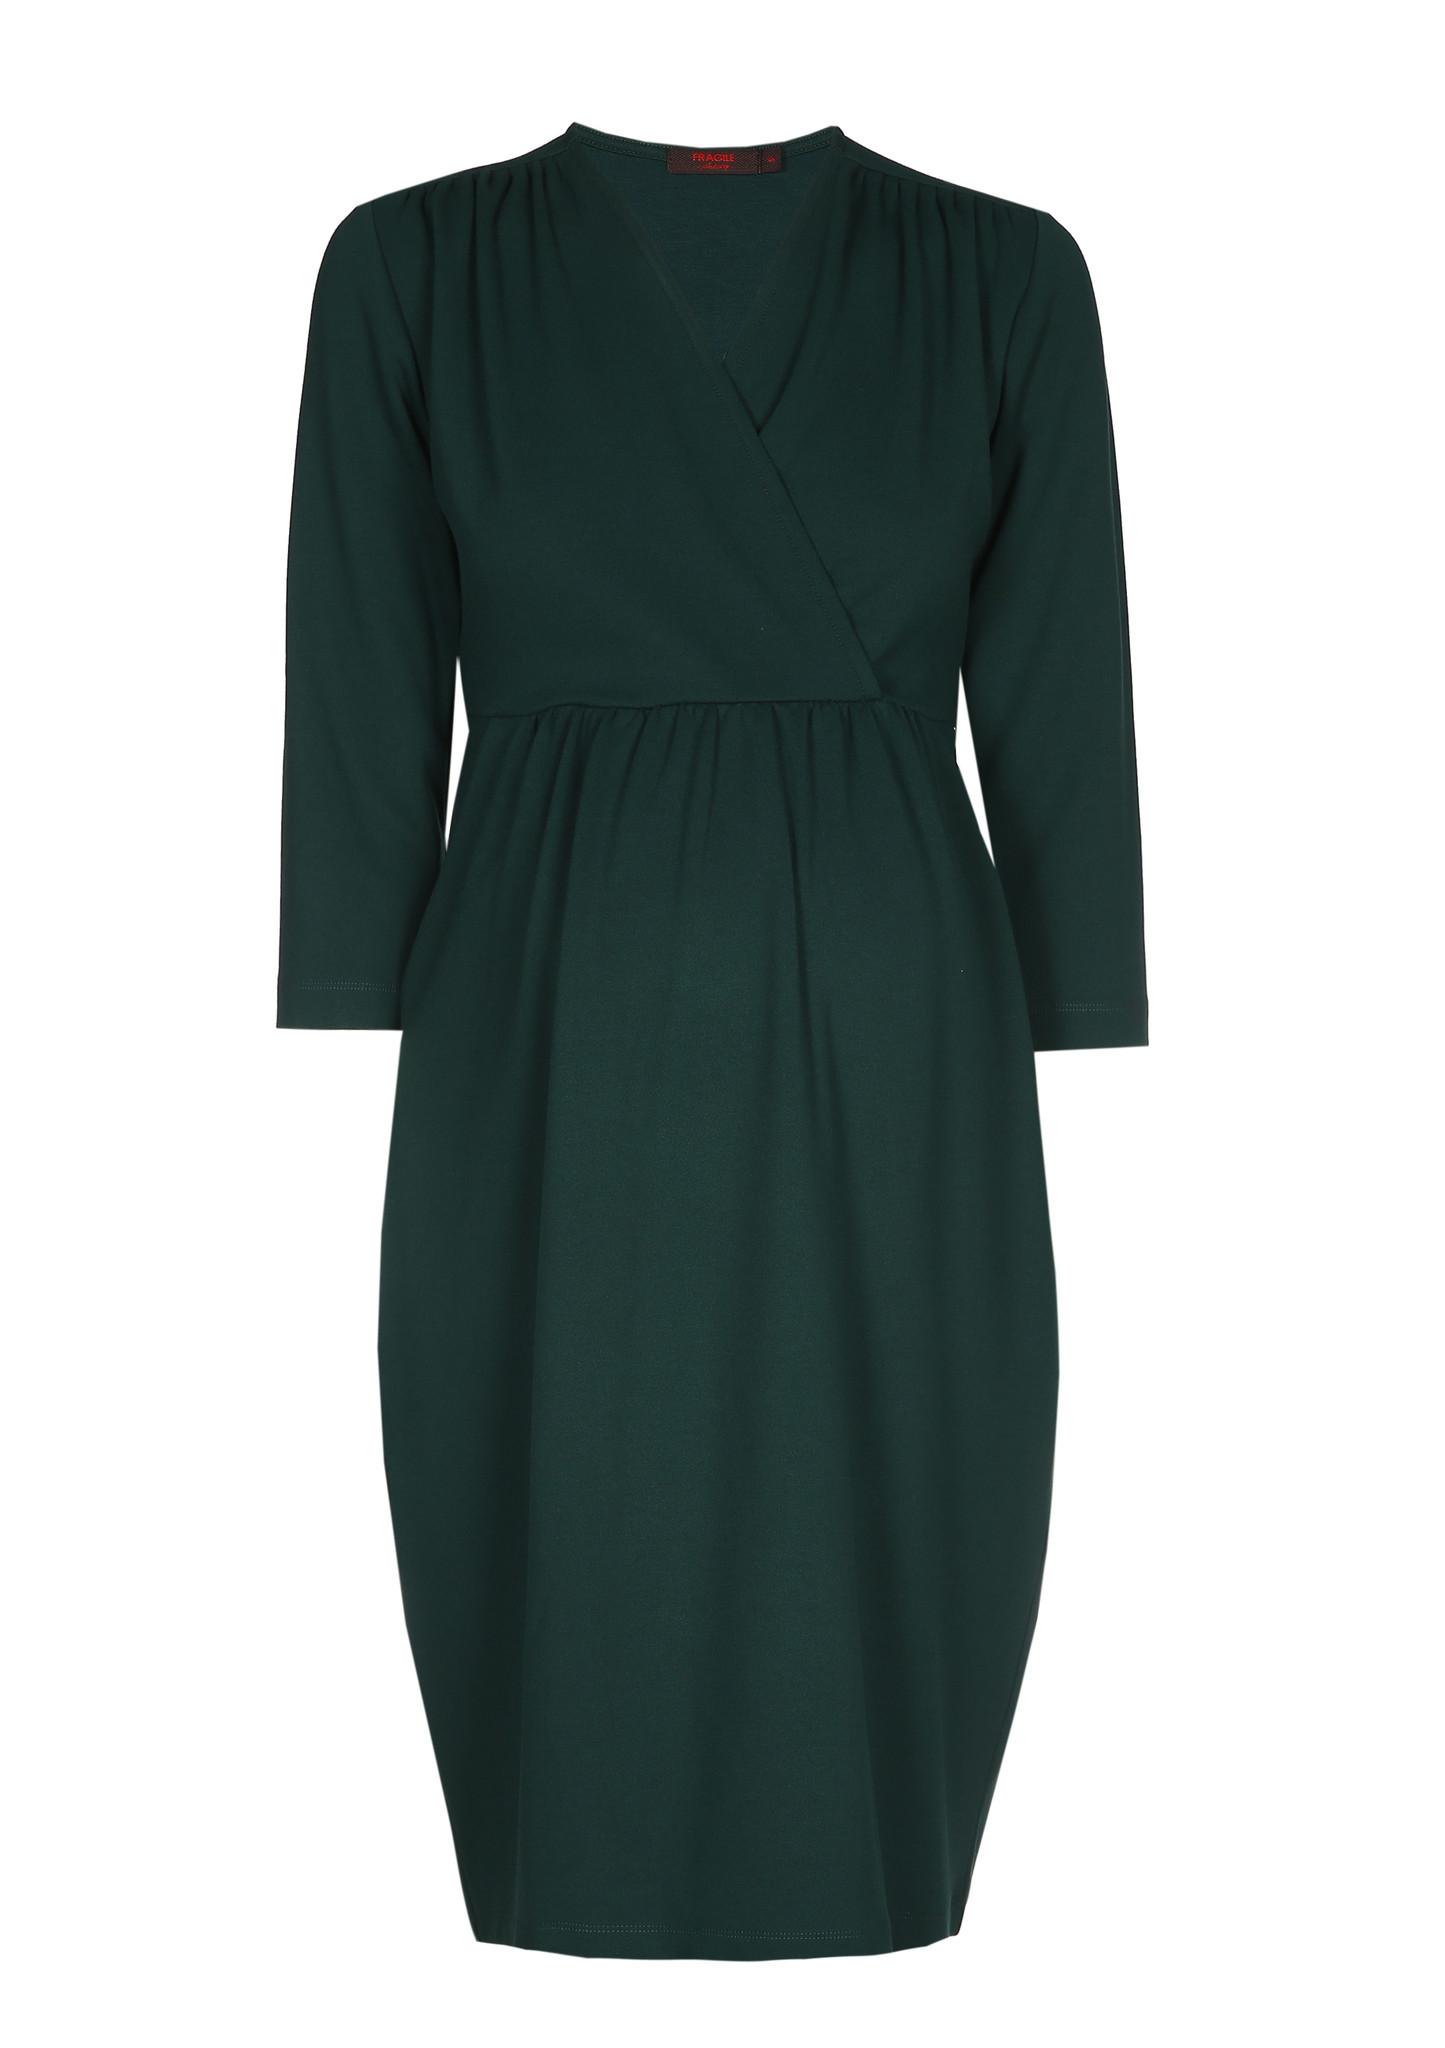 Comfy dress 7/8 sleeves - dark green-4